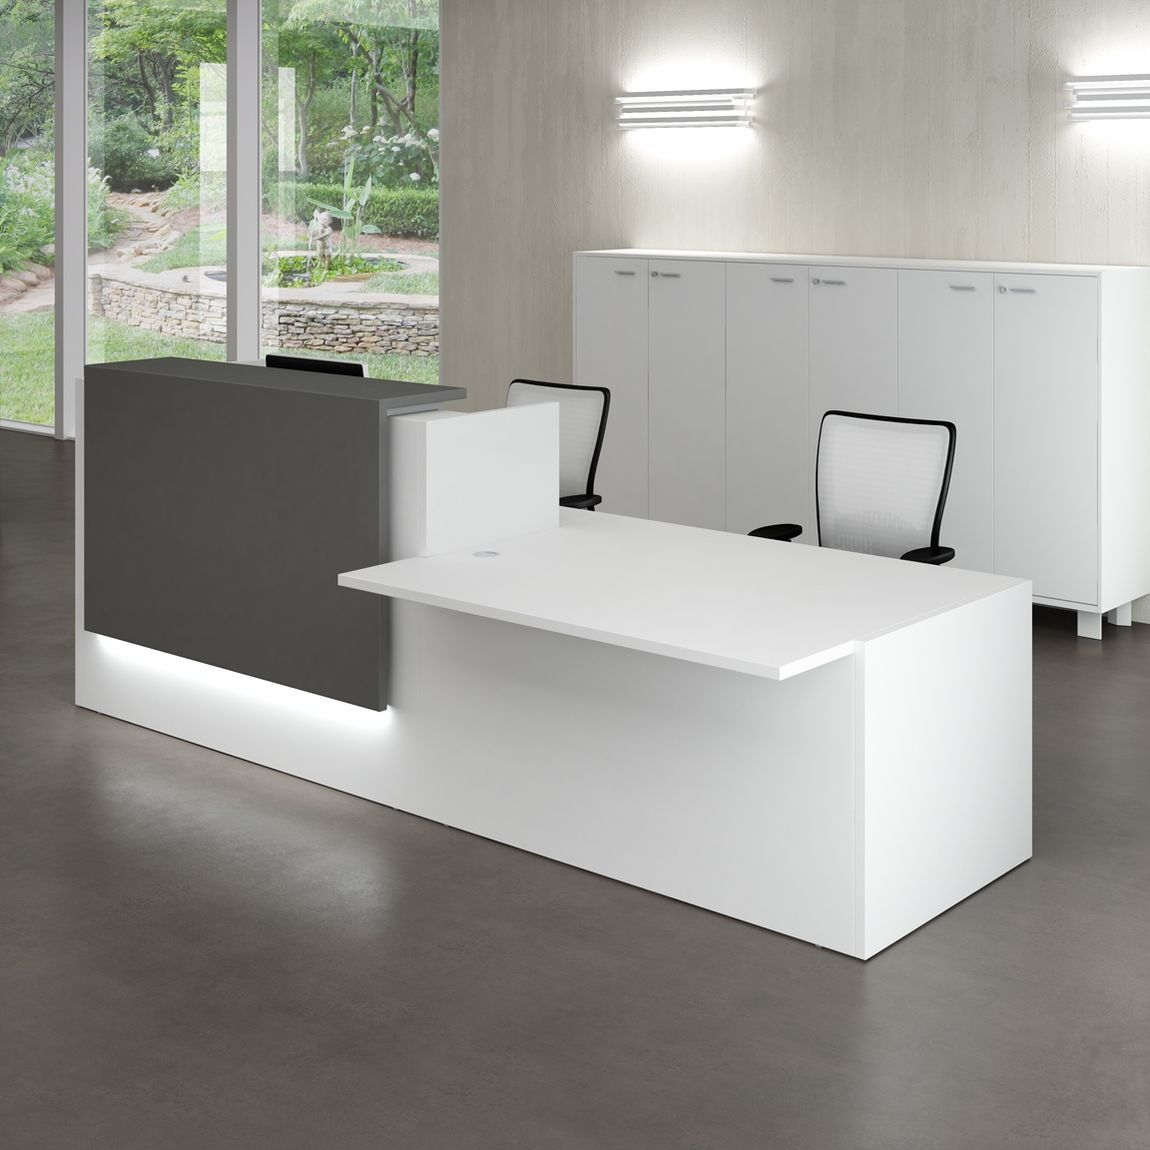 Wheelchair accessible desks as part of UniversalDesign in